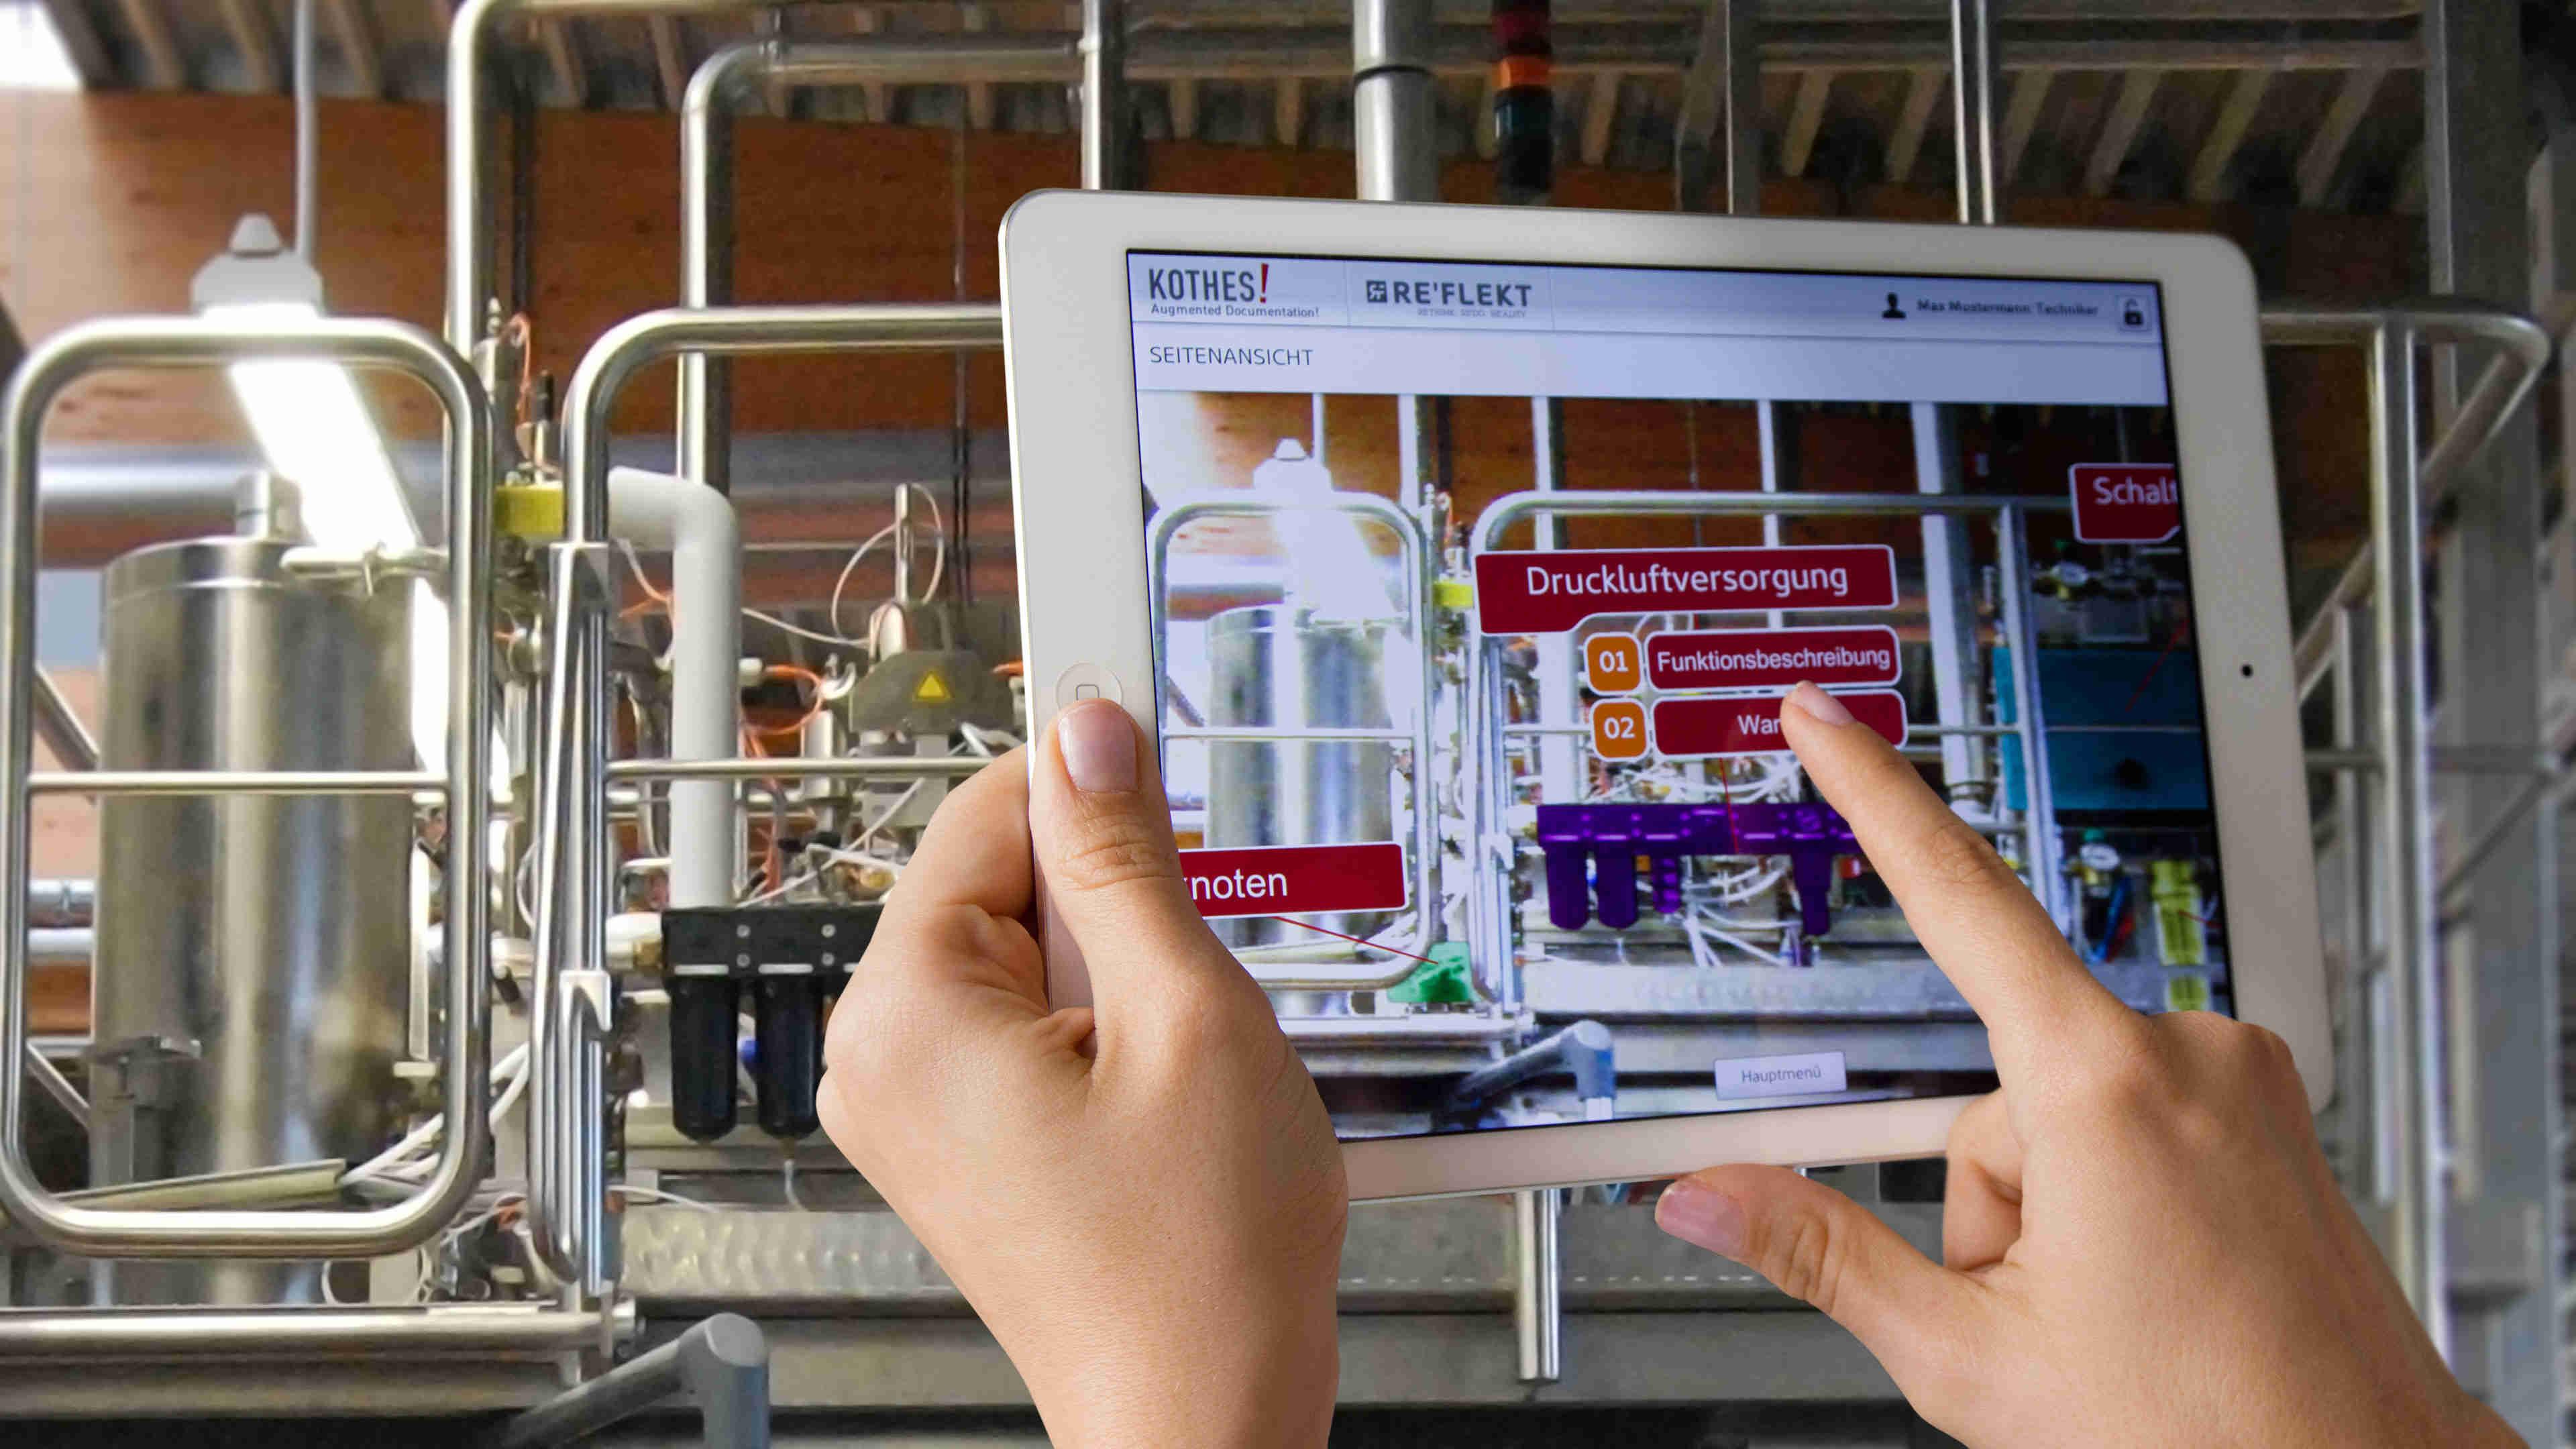 Kothes! Augmented Reality - Werkstoffzeitschrift